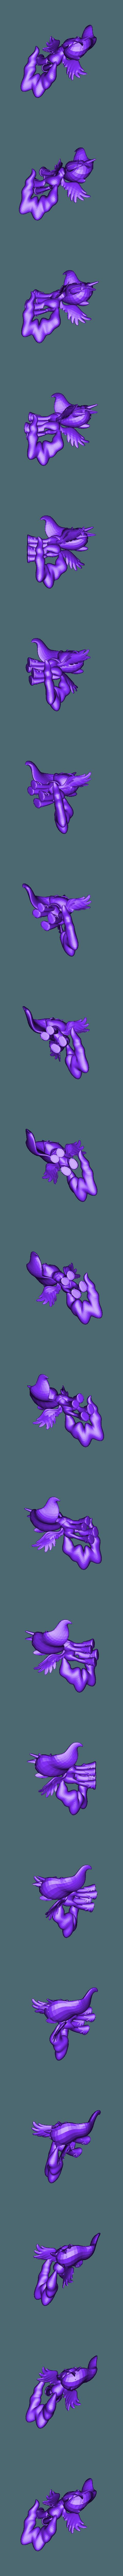 Cura celestia complete.stl Download free STL file MLP Pony Celestia • Design to 3D print, arcandg